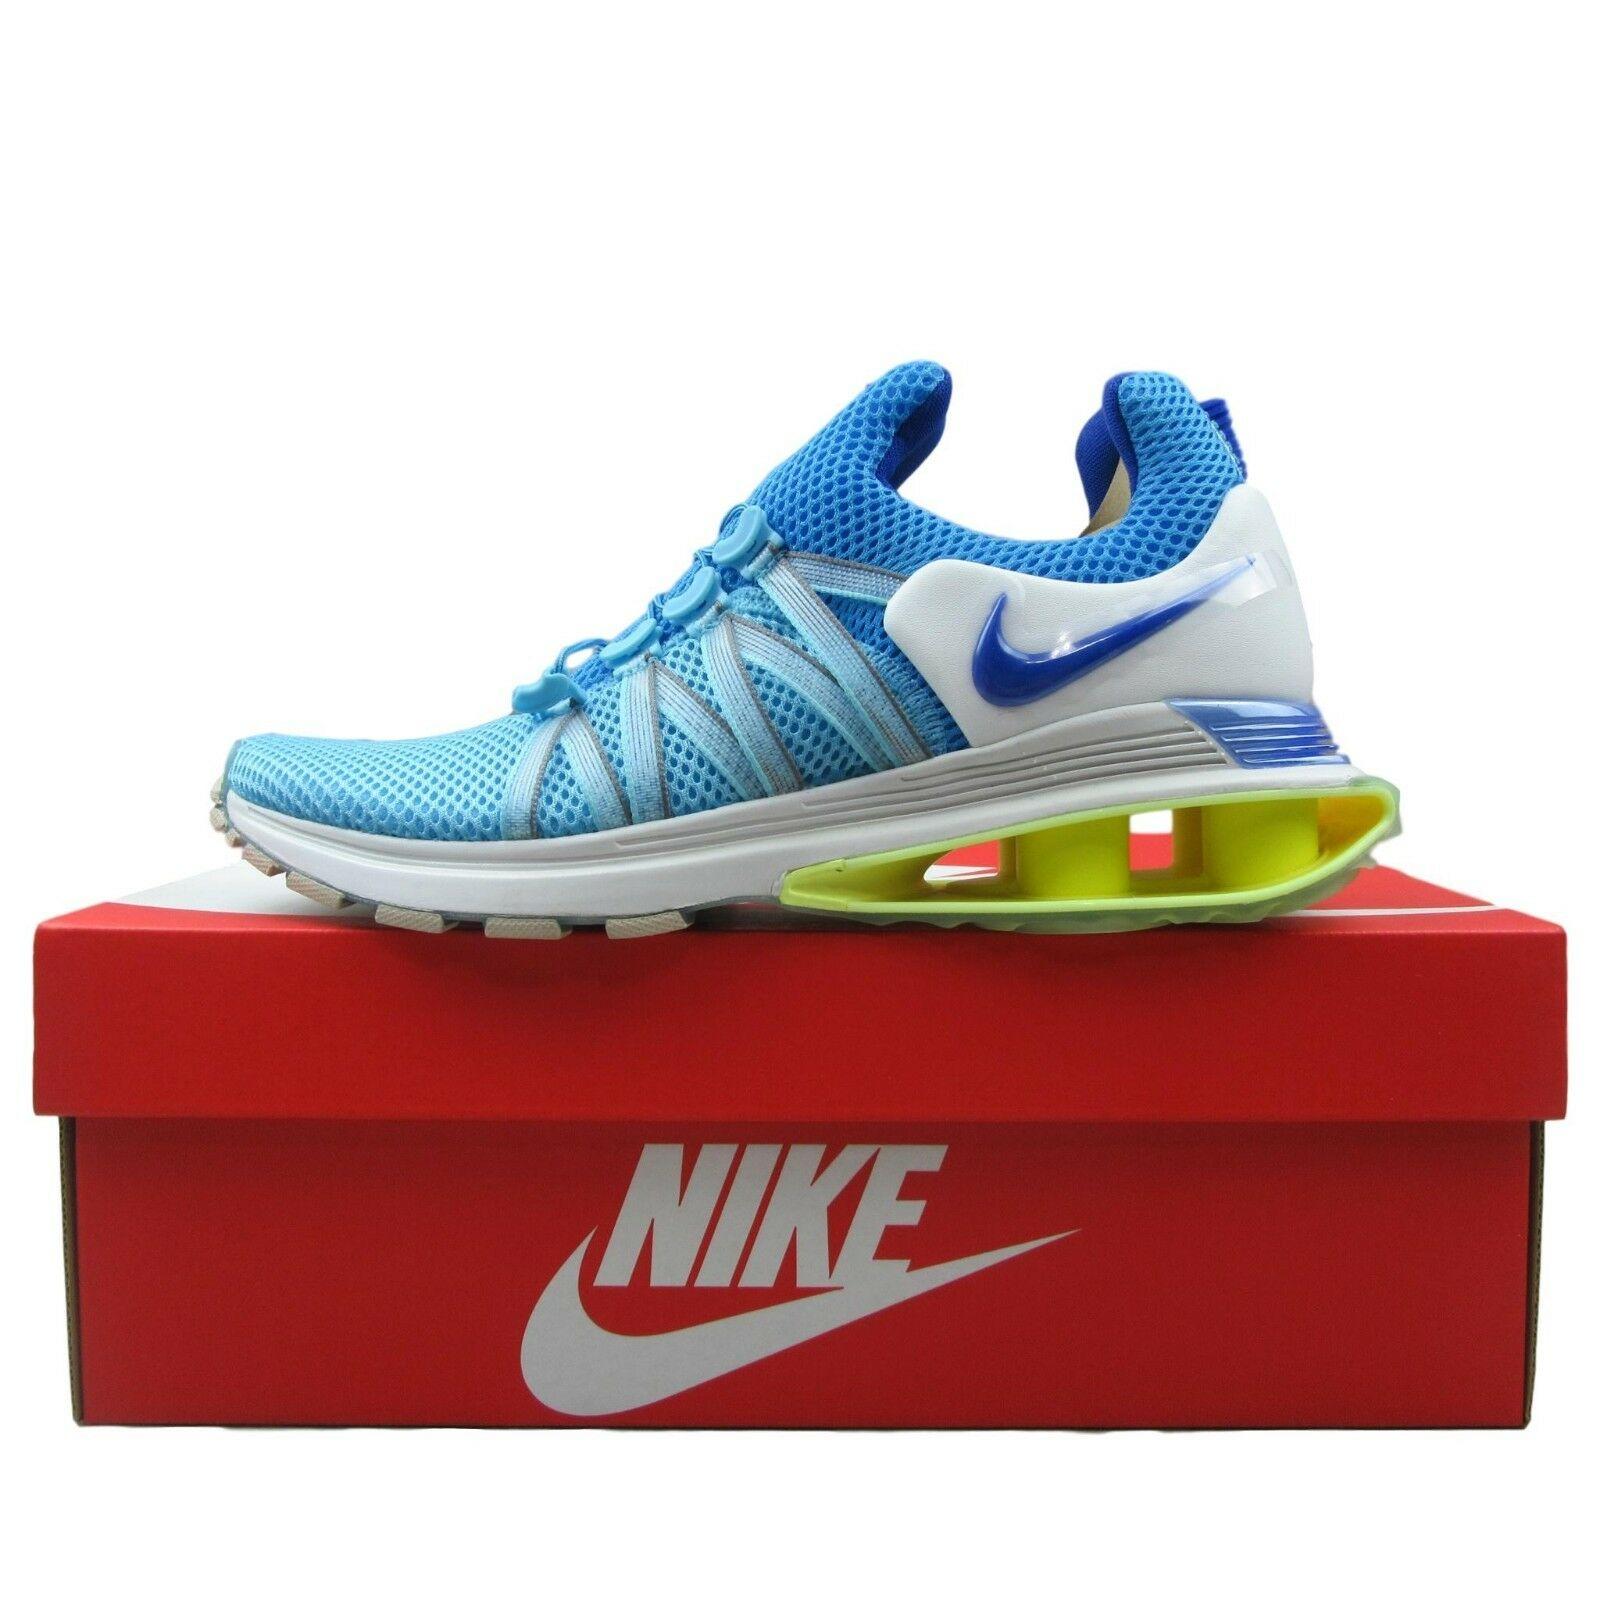 cheap for discount 99a6b 8b7ce nike-shox-gravity-womens-running-shoes-racer-blue-